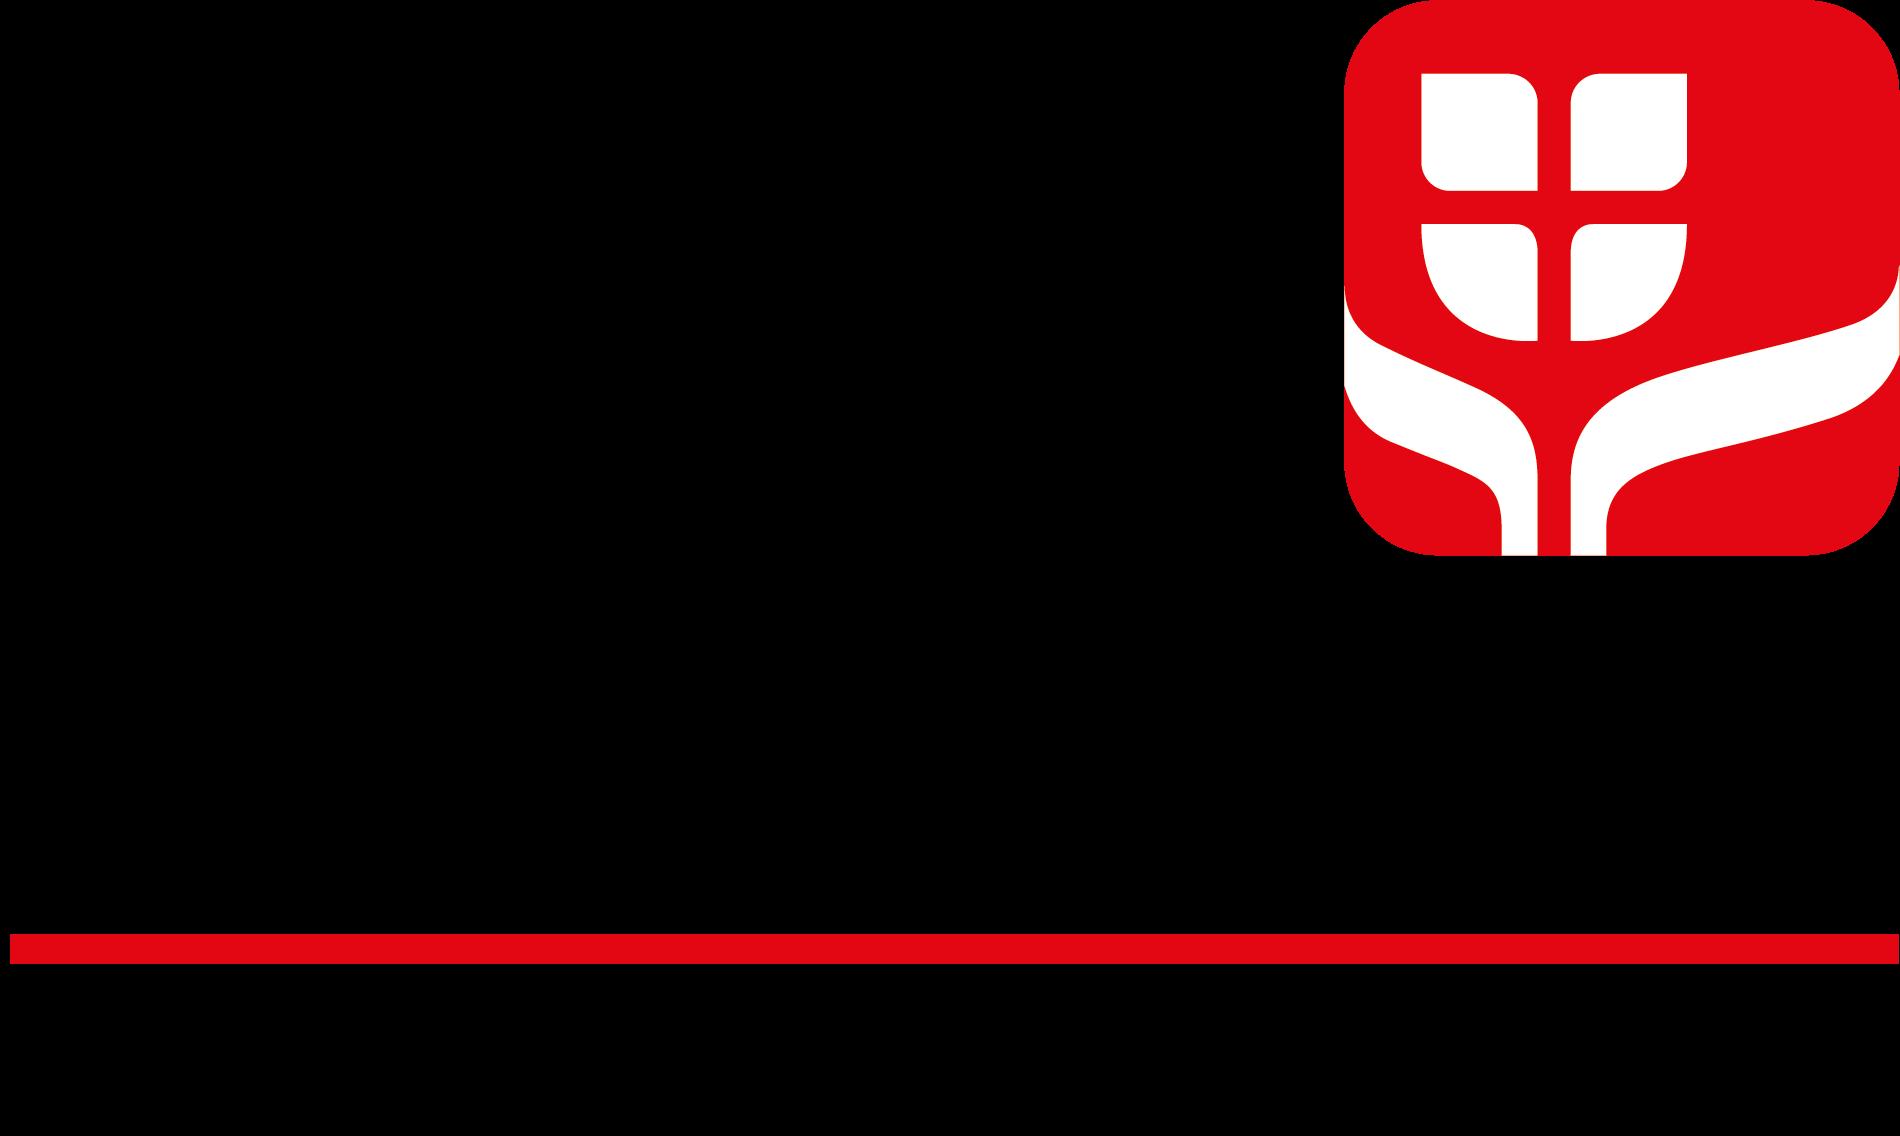 https://www.wienerstaedtische.at/privatkunden.html